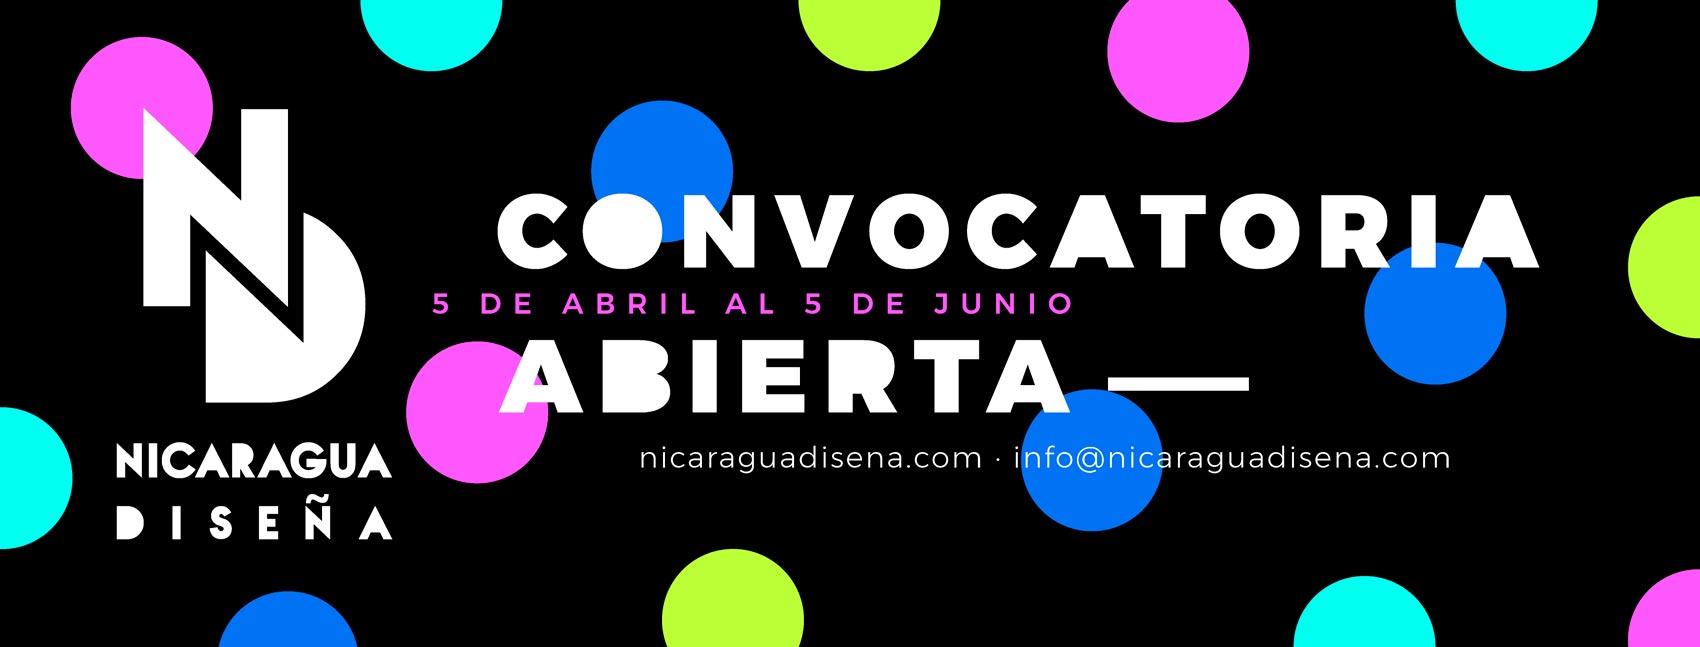 Banner-Convocatoria-ND-2017